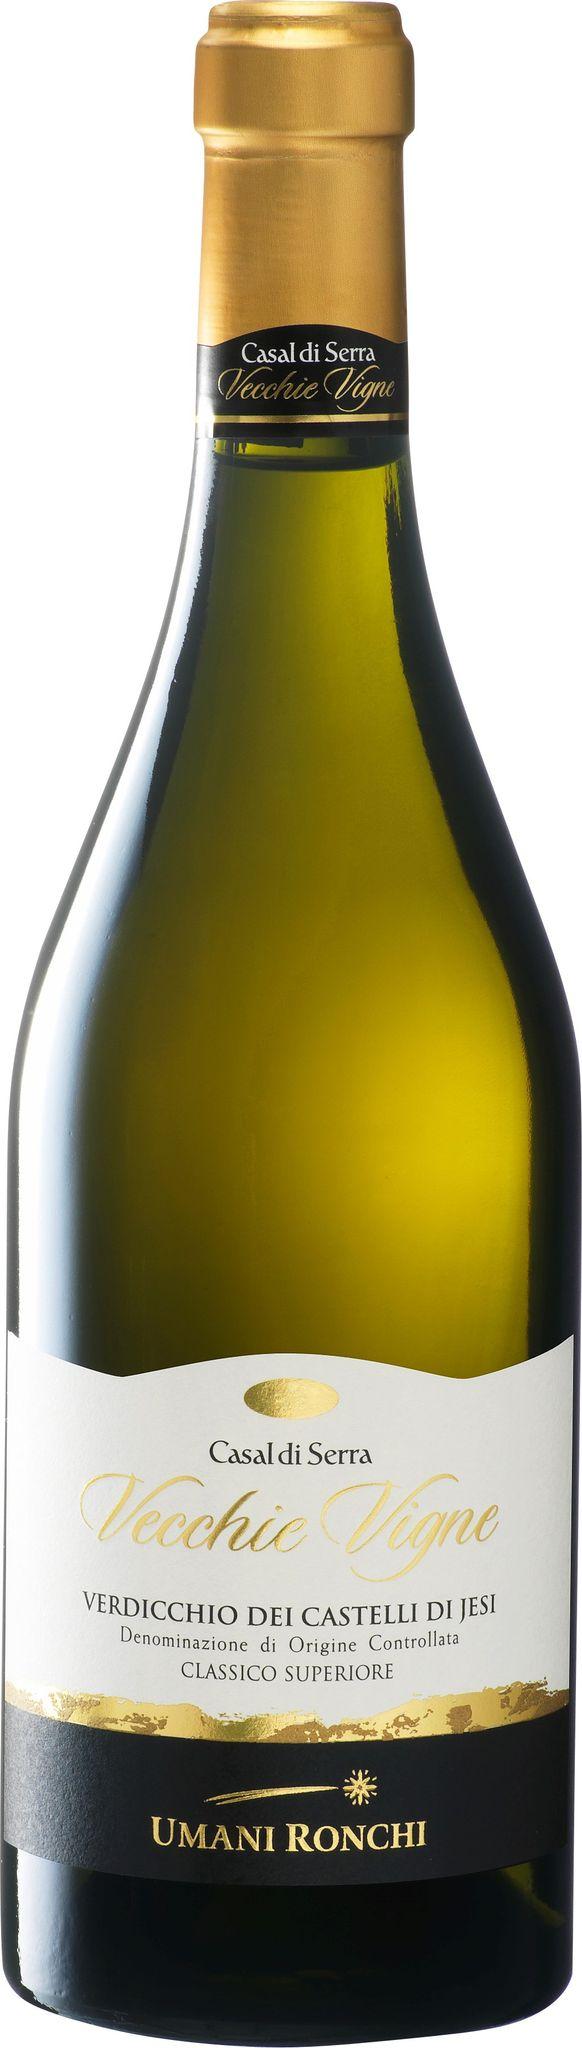 Produktbild på Casal di Serra Vecchie Vigne